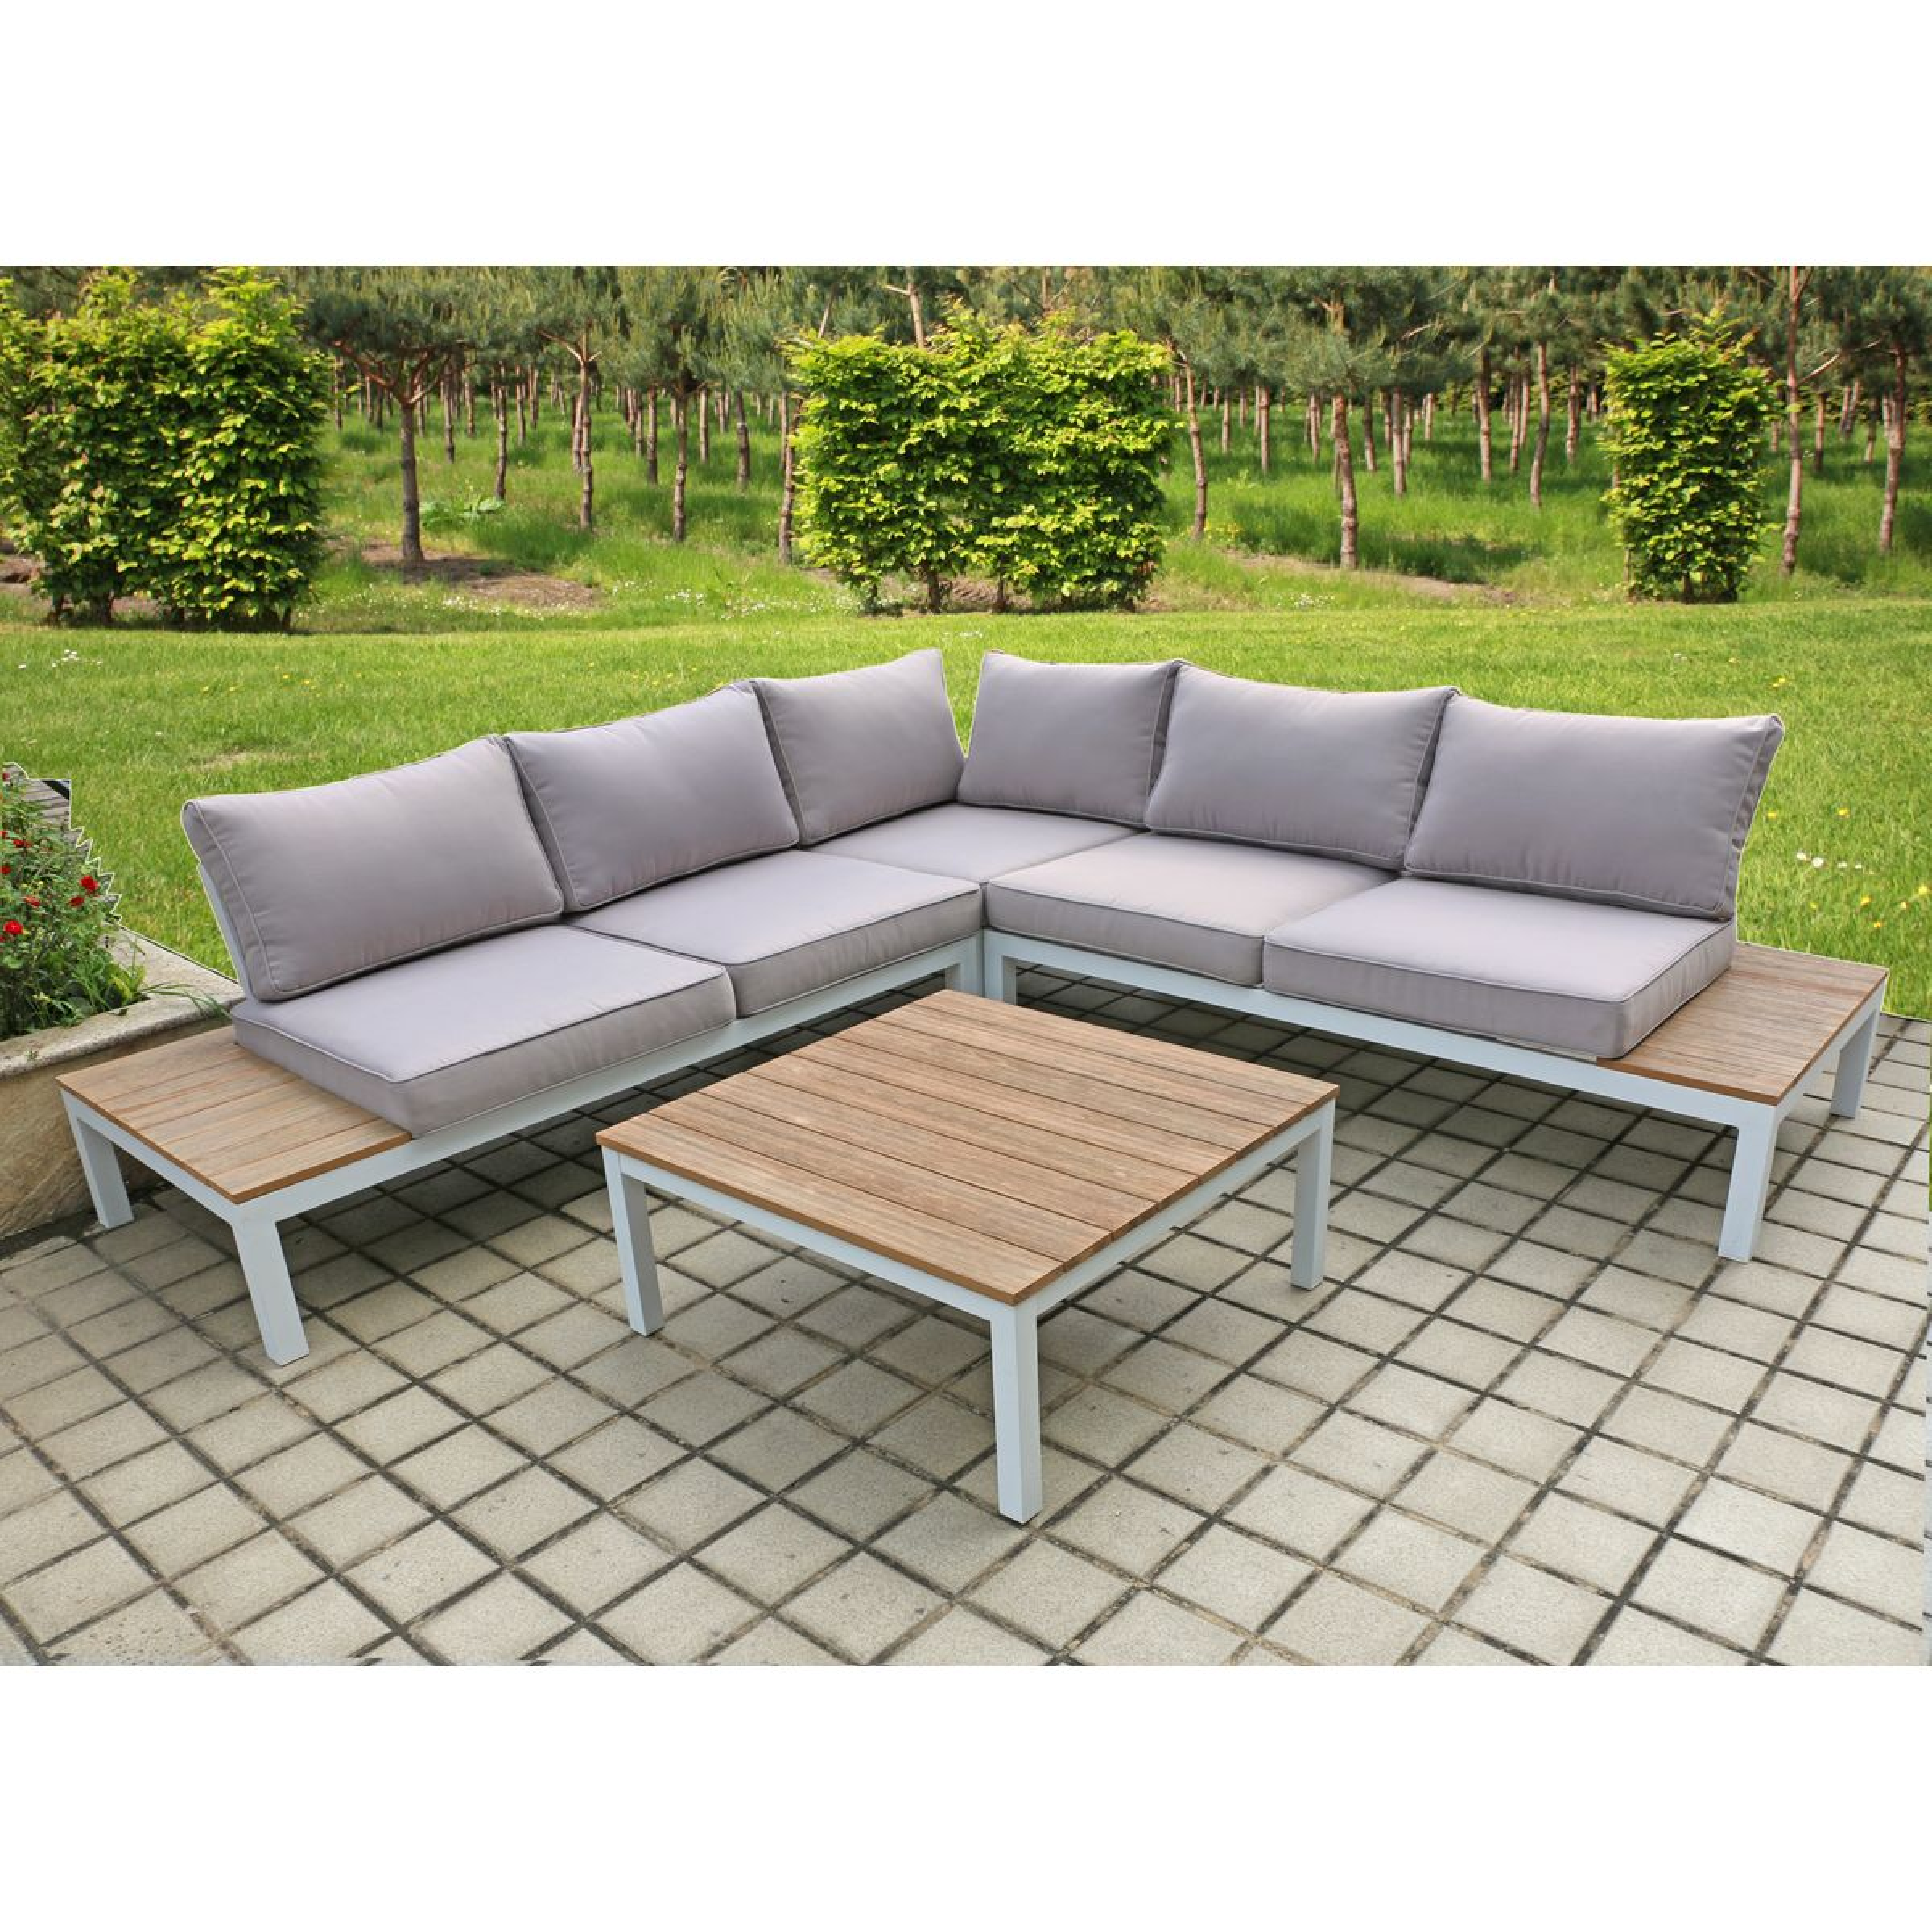 Fabulous 4-tlg. Lounge-Set Sitzecke Sitzgruppe Tischgruppe Gartengruppe YM24